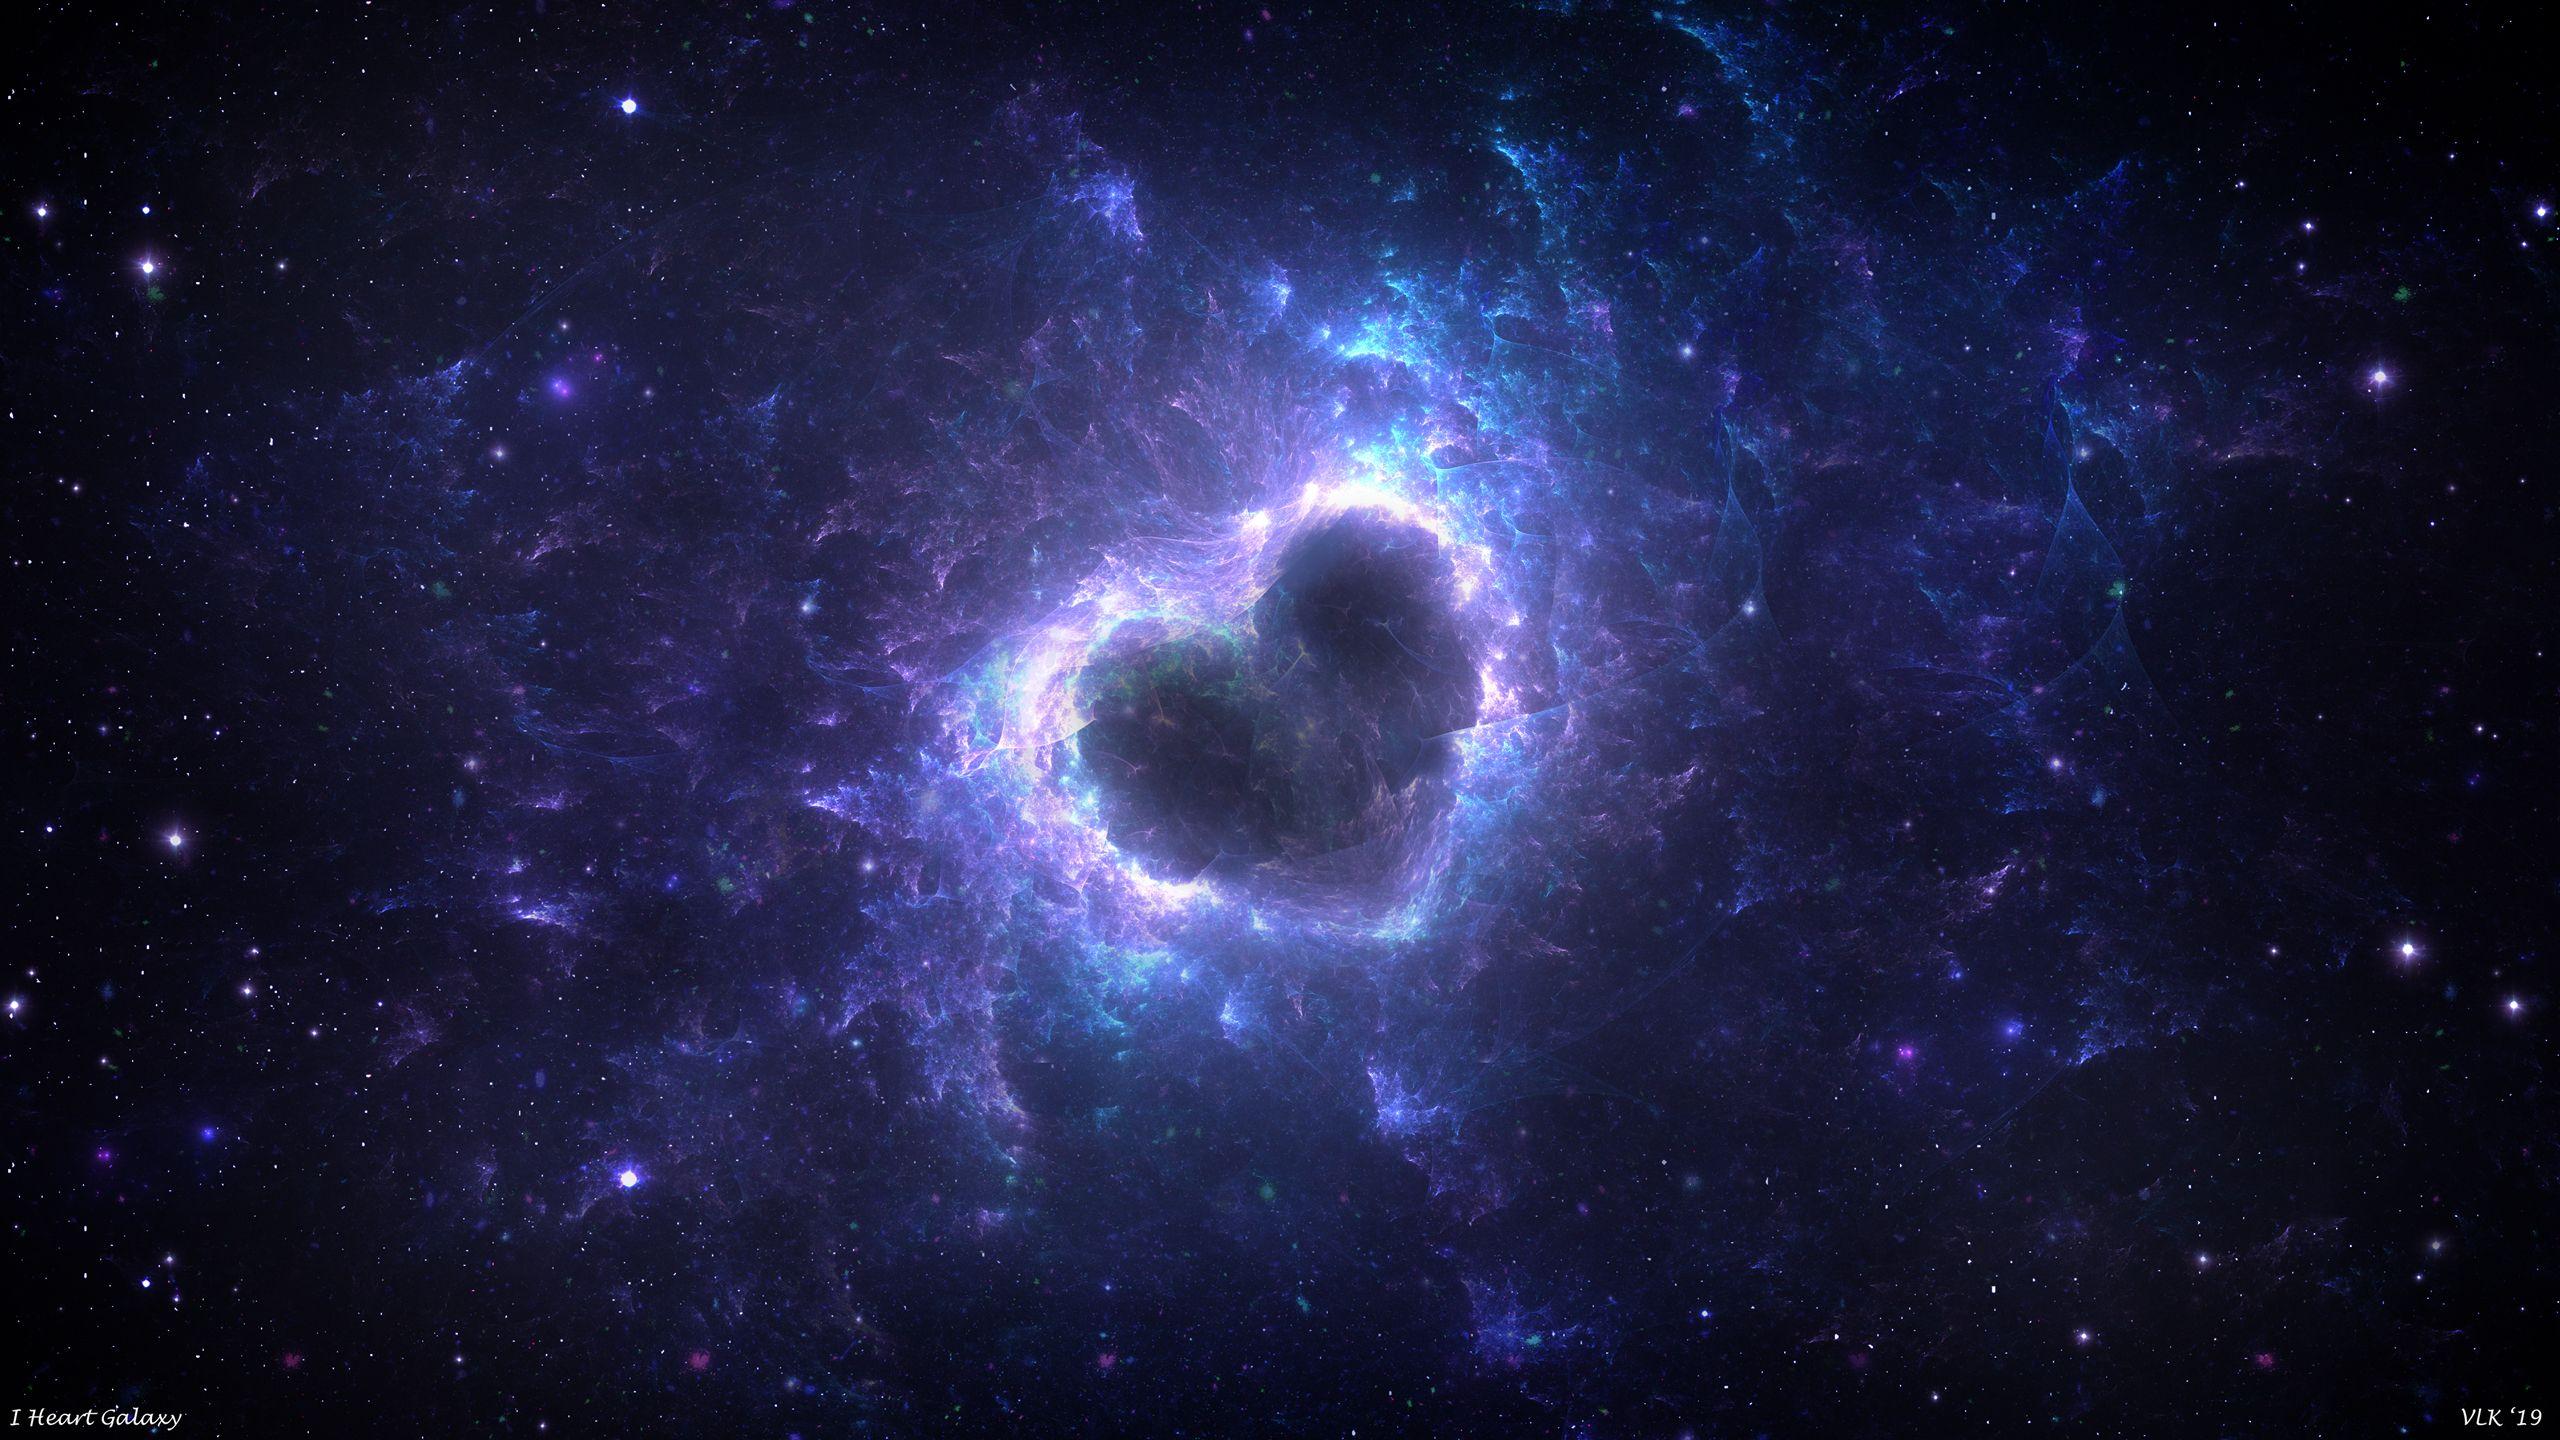 Heart Love Space Stars Galaxy Wallpaper No 766570 Wallhaven Cc Heart Wallpaper Hd Galaxy Wallpaper Heart Wallpaper